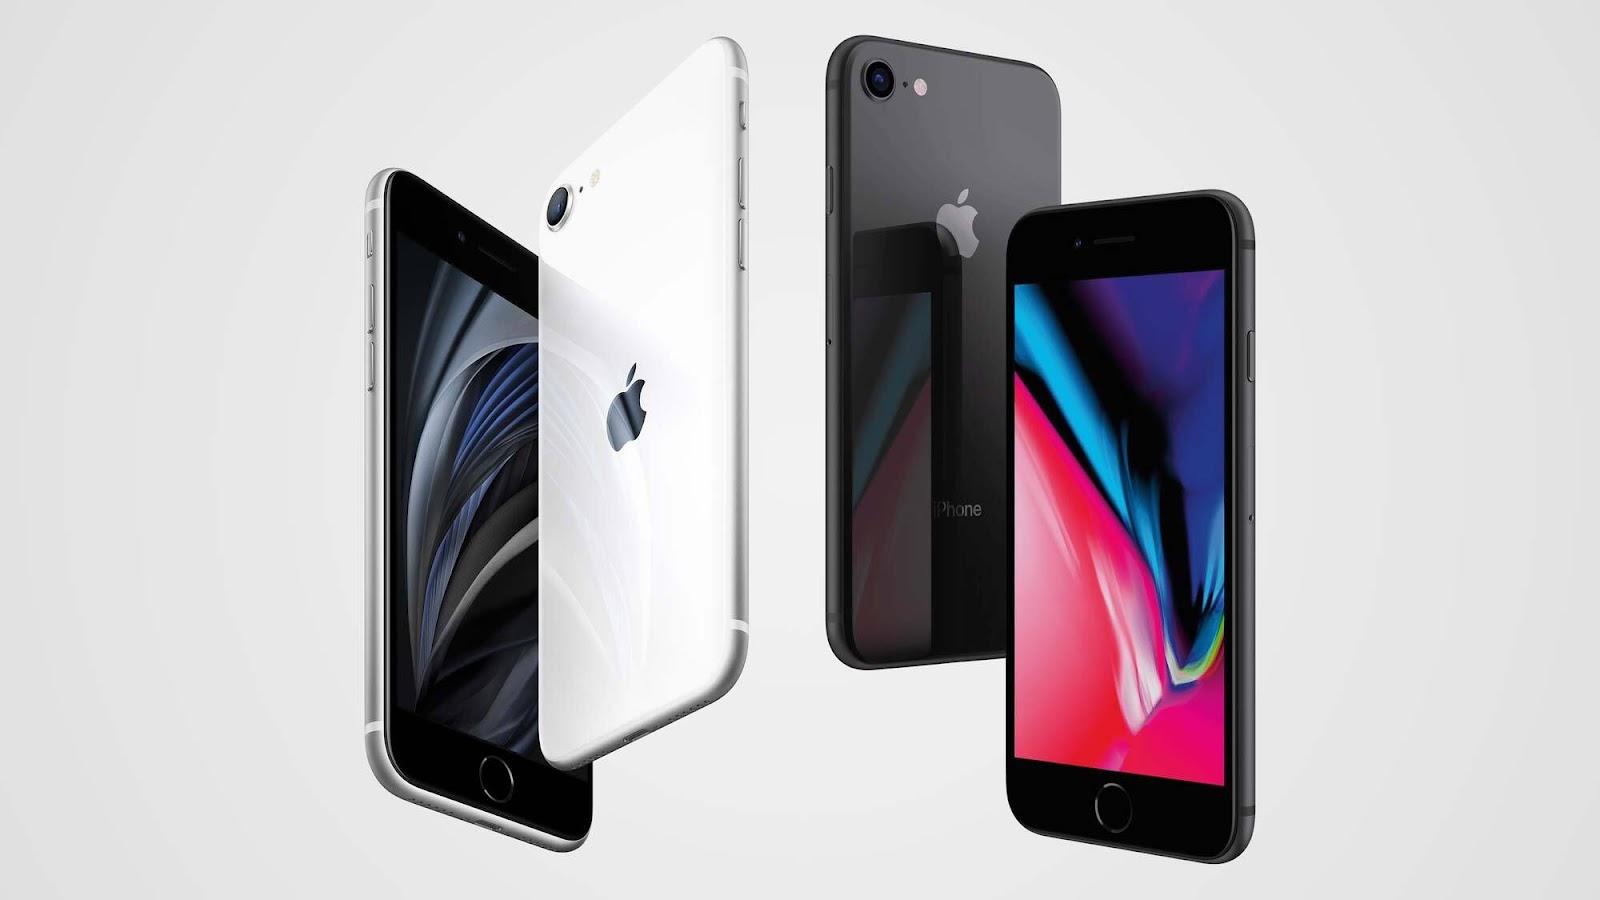 Chọn iPhone 12 mini hay iPhone SE 2020 khi chênh nhau 9 triệu đồng? - 3